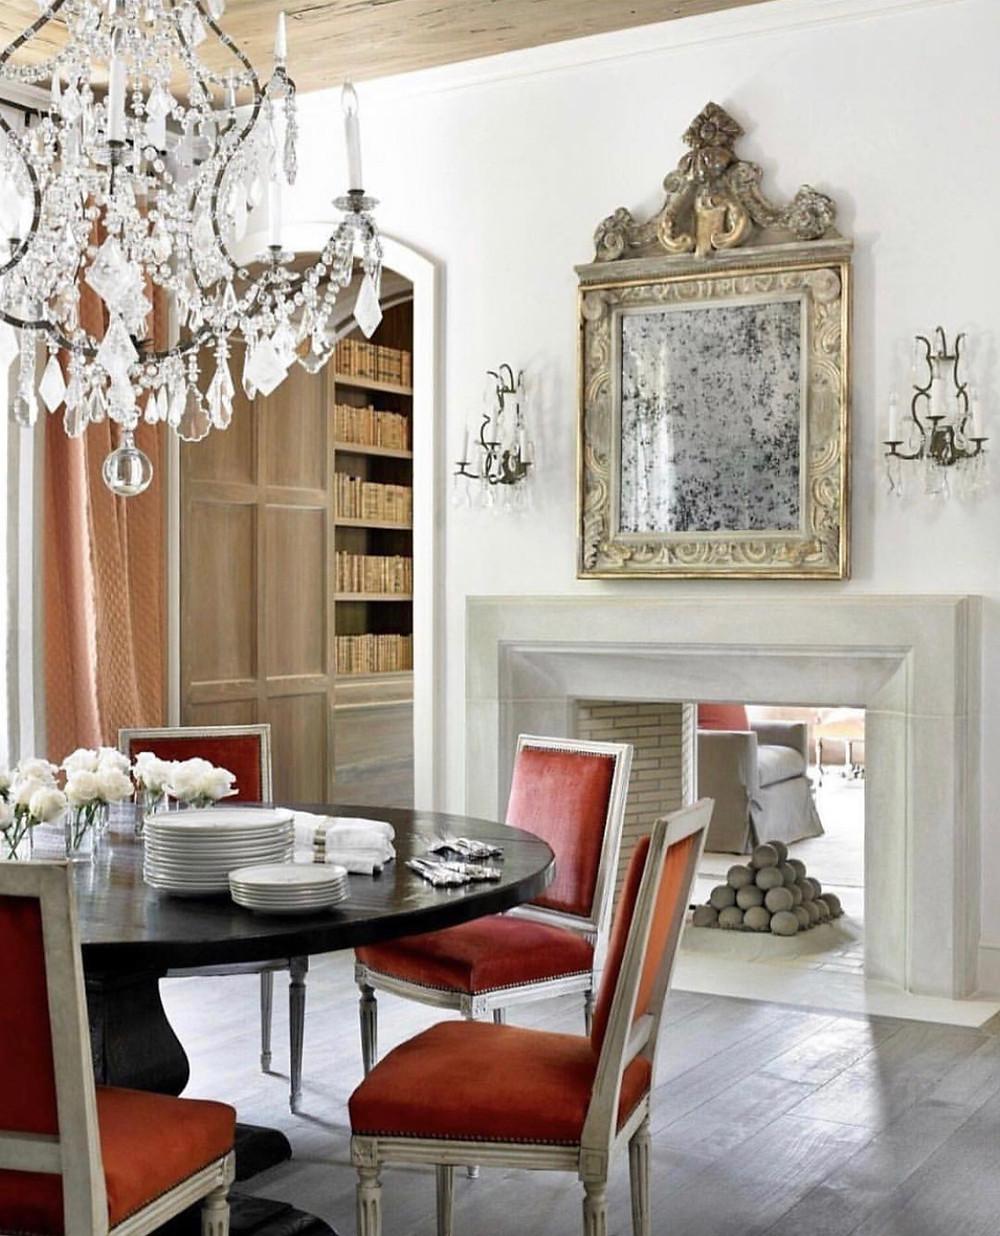 Fireplace+Heaven!+--+Mary+Hannah+Interiors+--+Studio+BLog